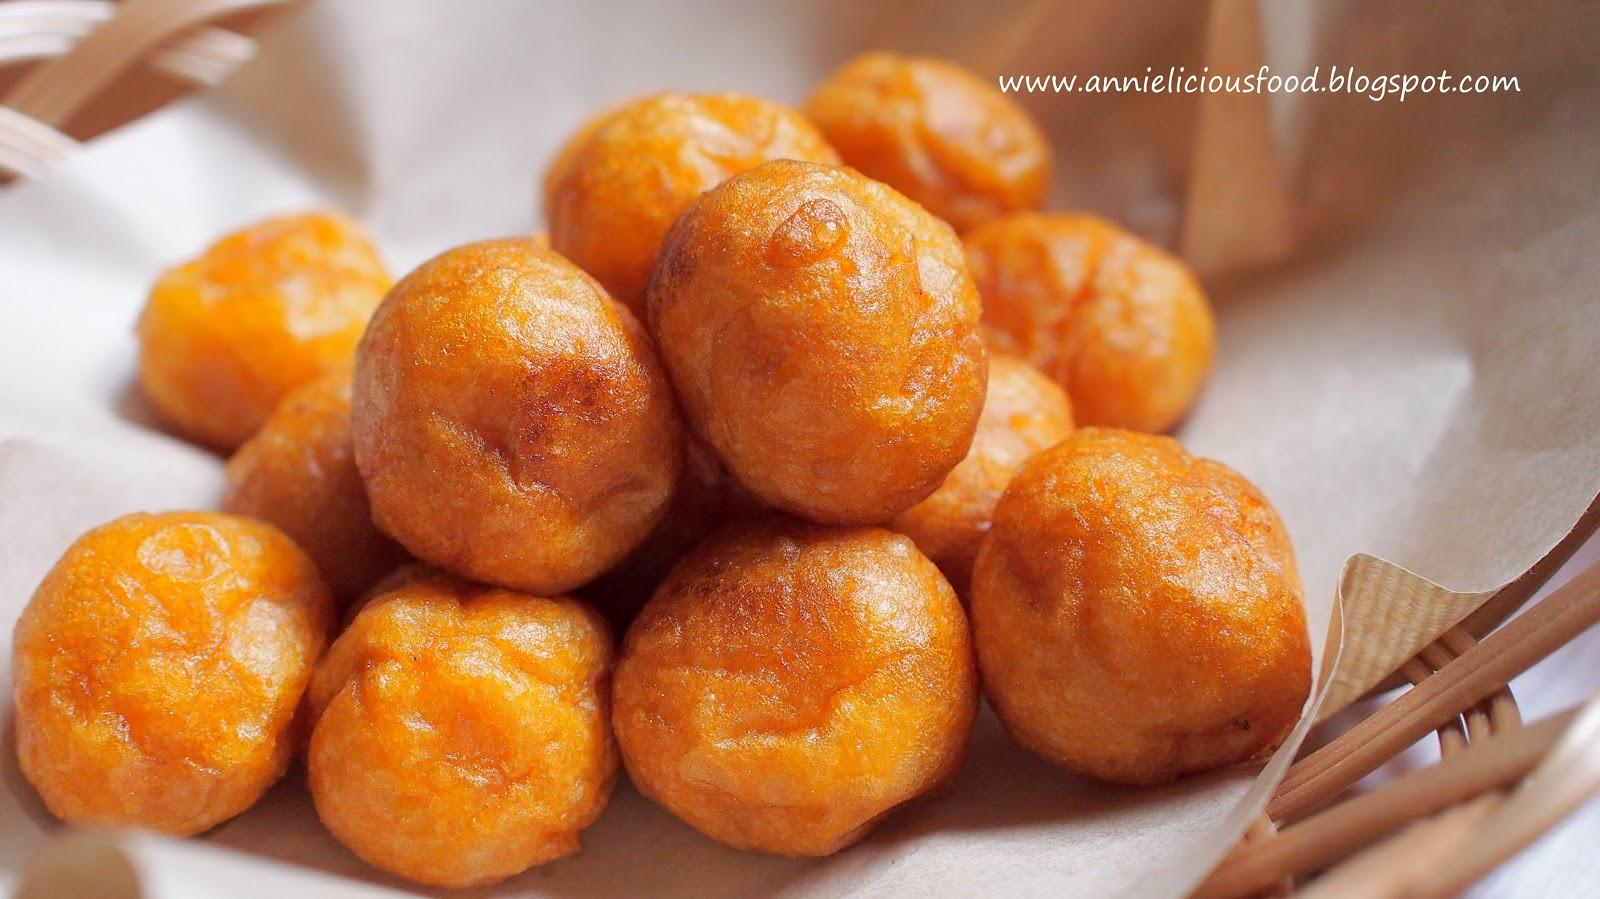 Sweet Potato Balls  Annielicious Food Fried Sweet Potato Balls 炸番薯蛋 MFF